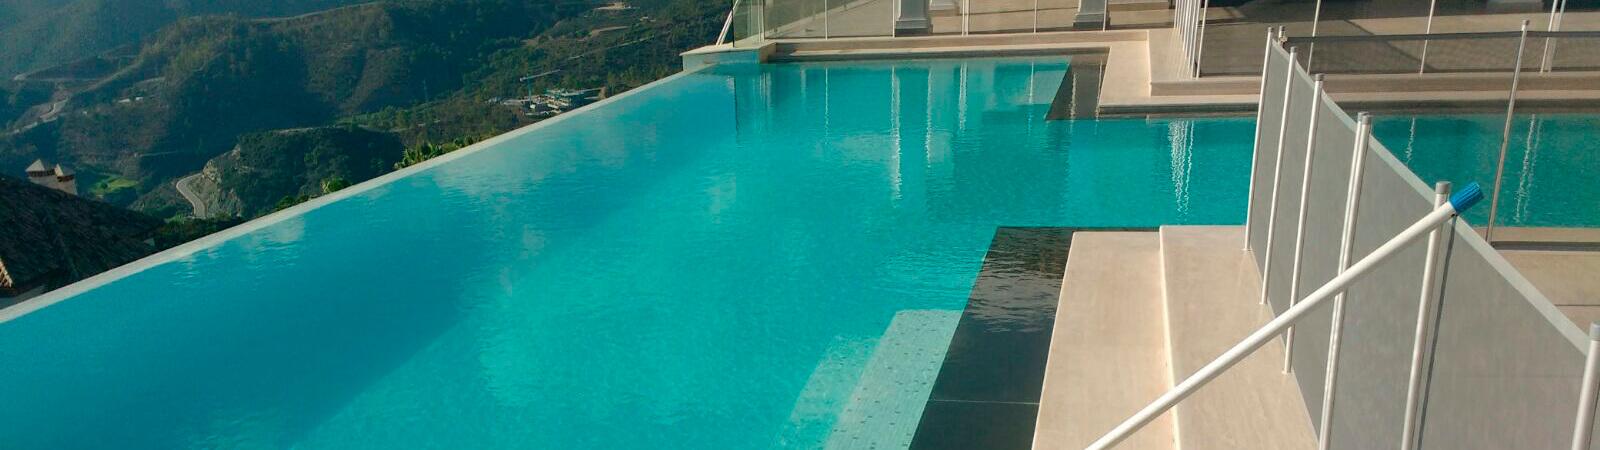 Pool and garden maintenance, house in La Zagaleta area, Marbella